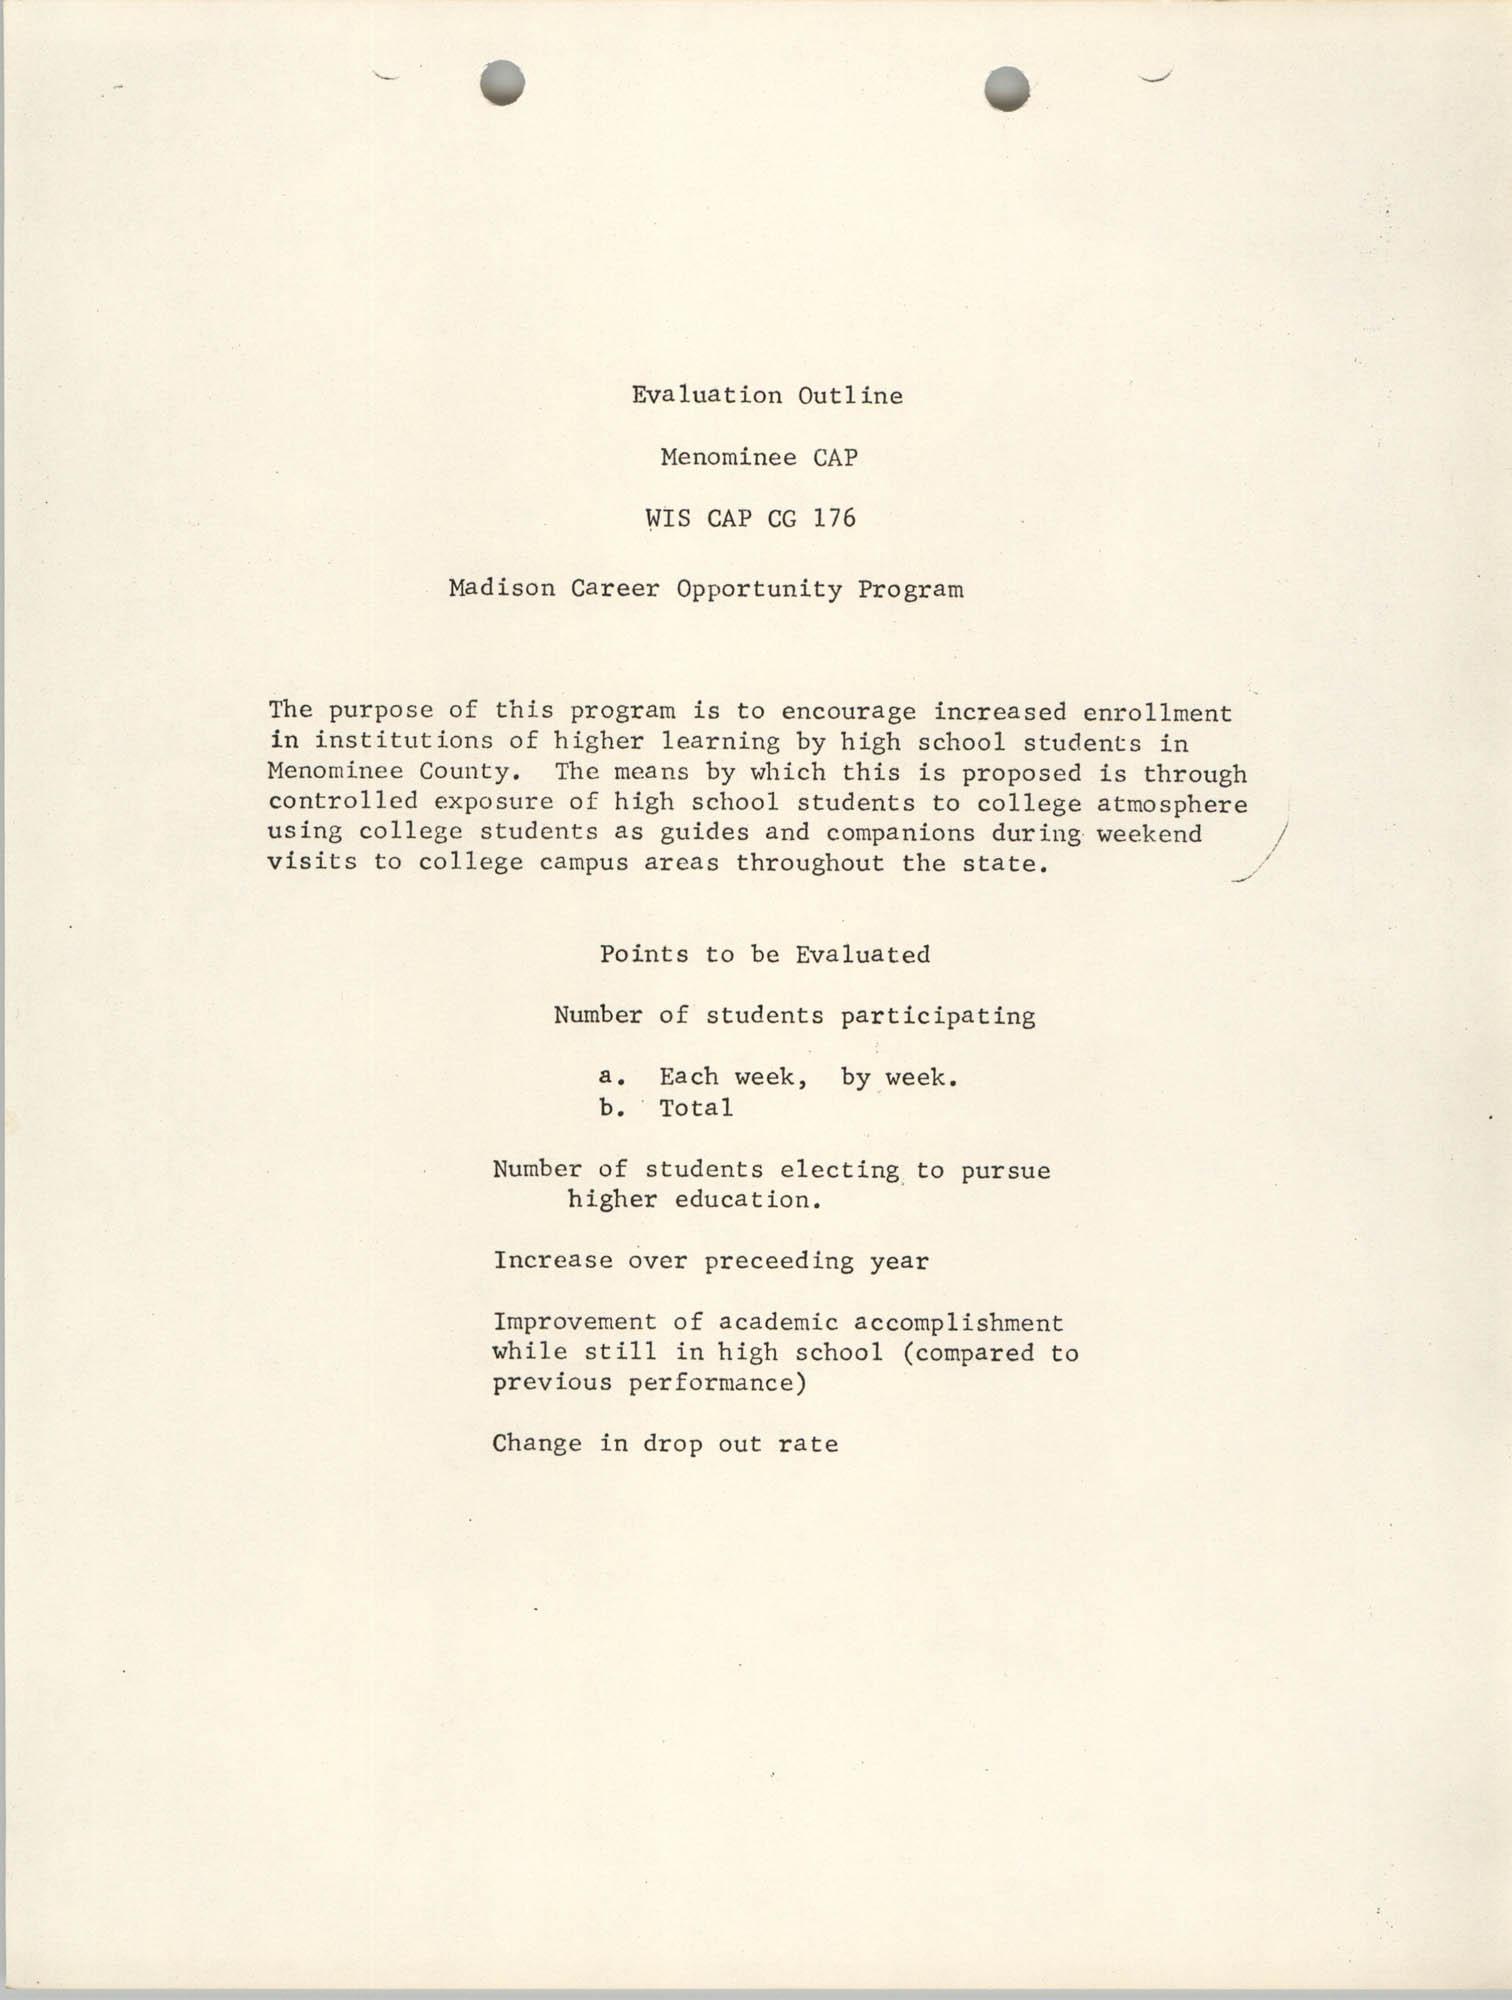 Evaluation Outline, Menominee CAP